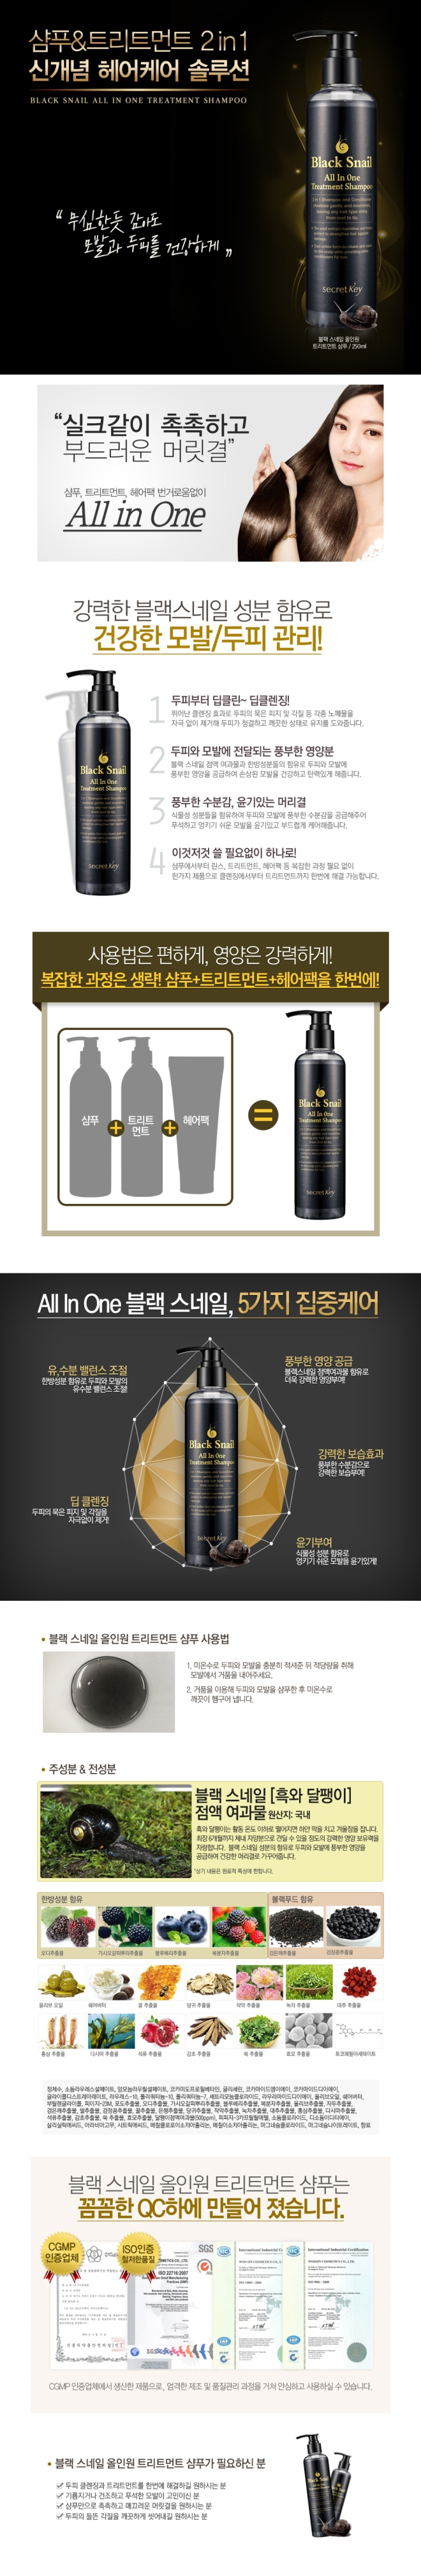 Credit: SecretKey Korea website